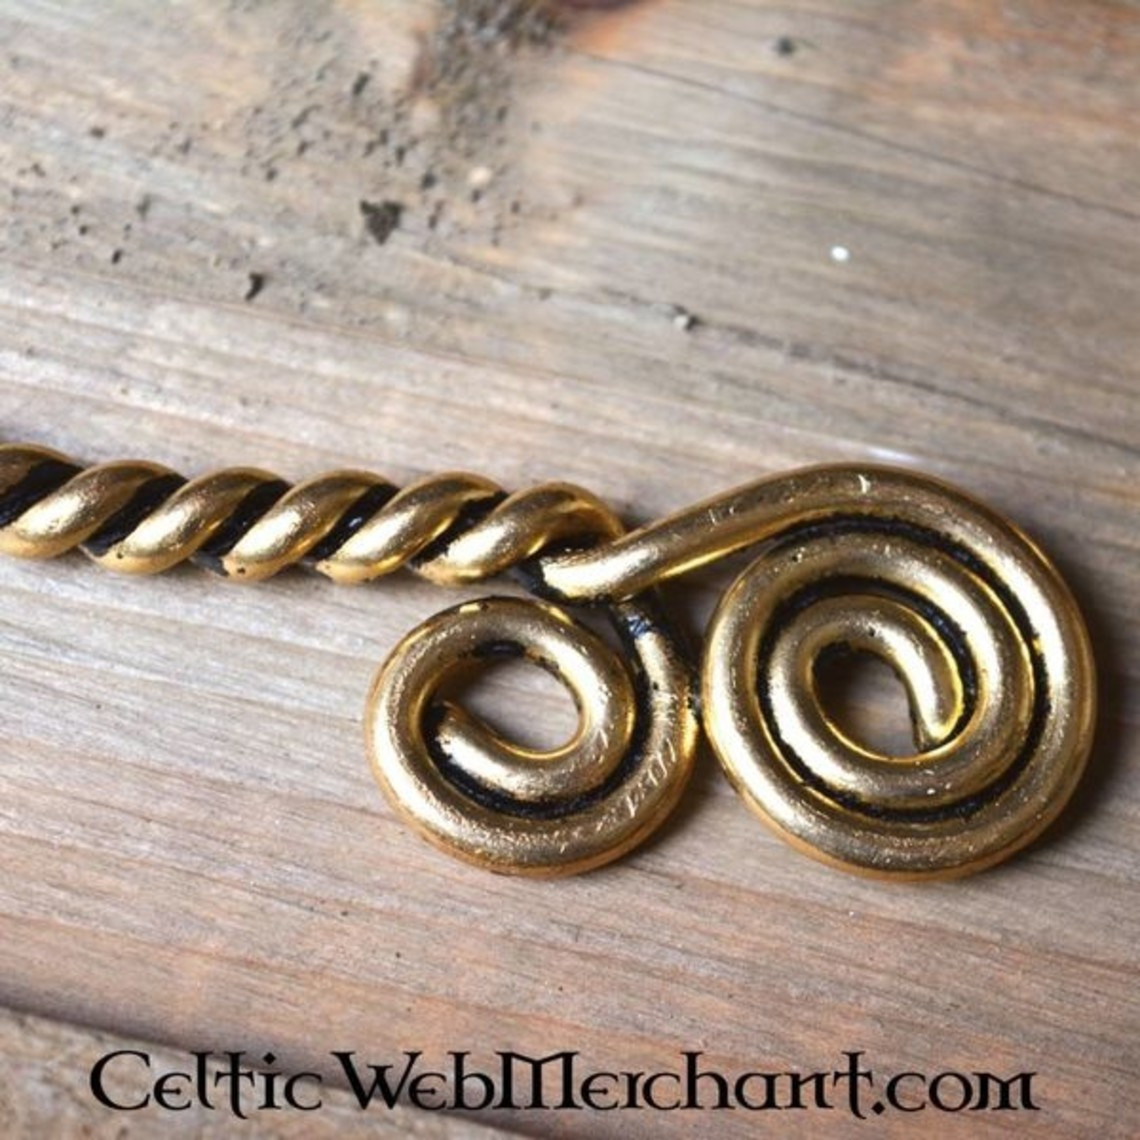 Moment med Celtic spiraler, forsølvede